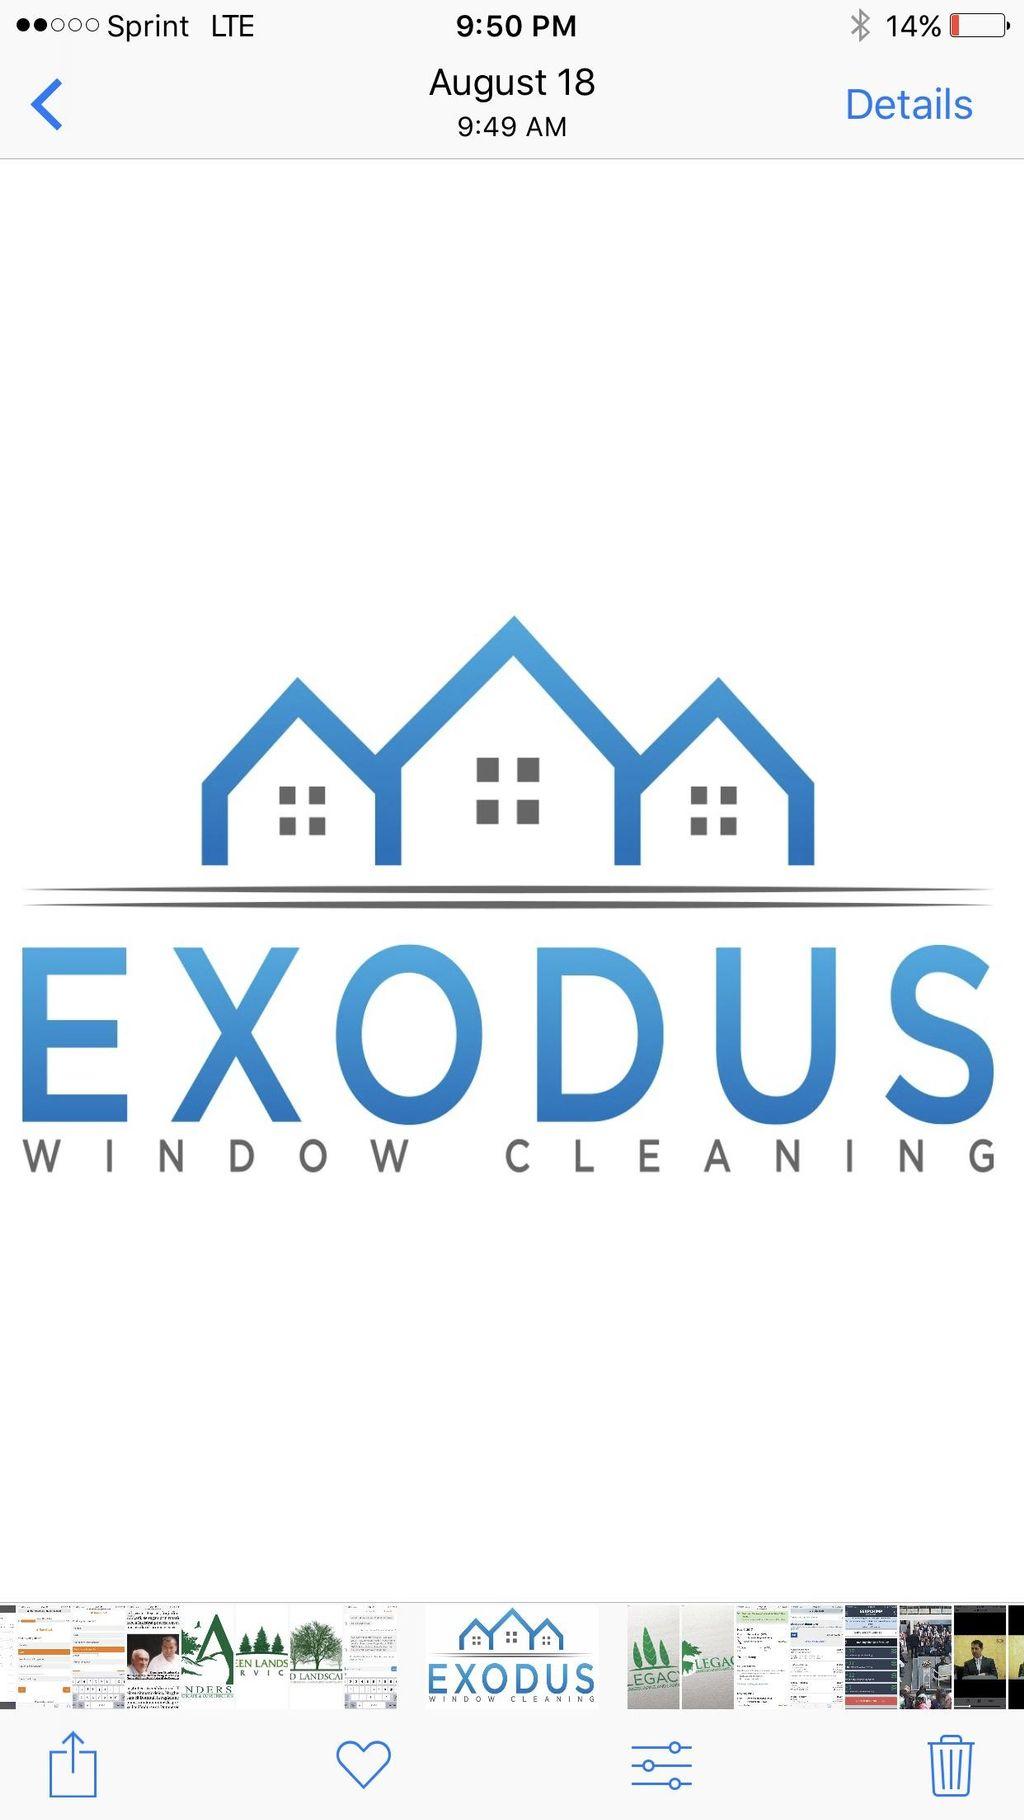 Exodus Window Cleaning